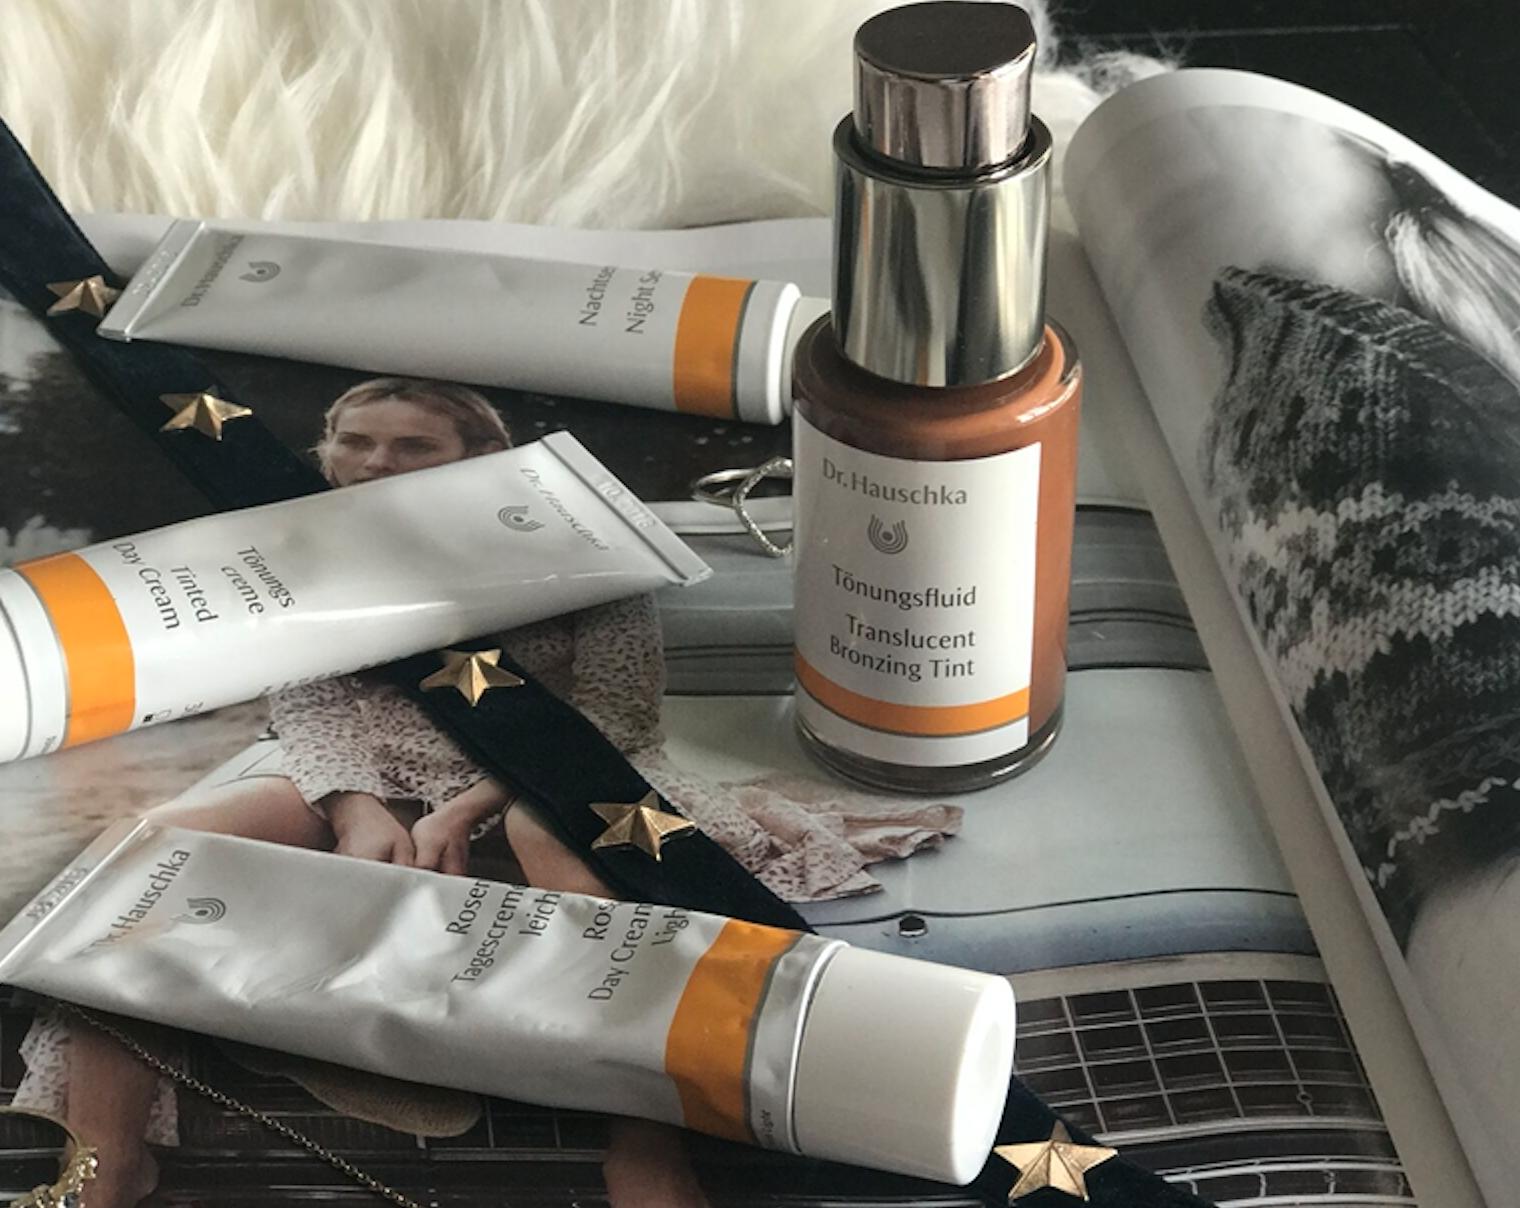 Dr Hauschka's Translucent Bronzing tint Beauty Blogger Review, The Creative Larder